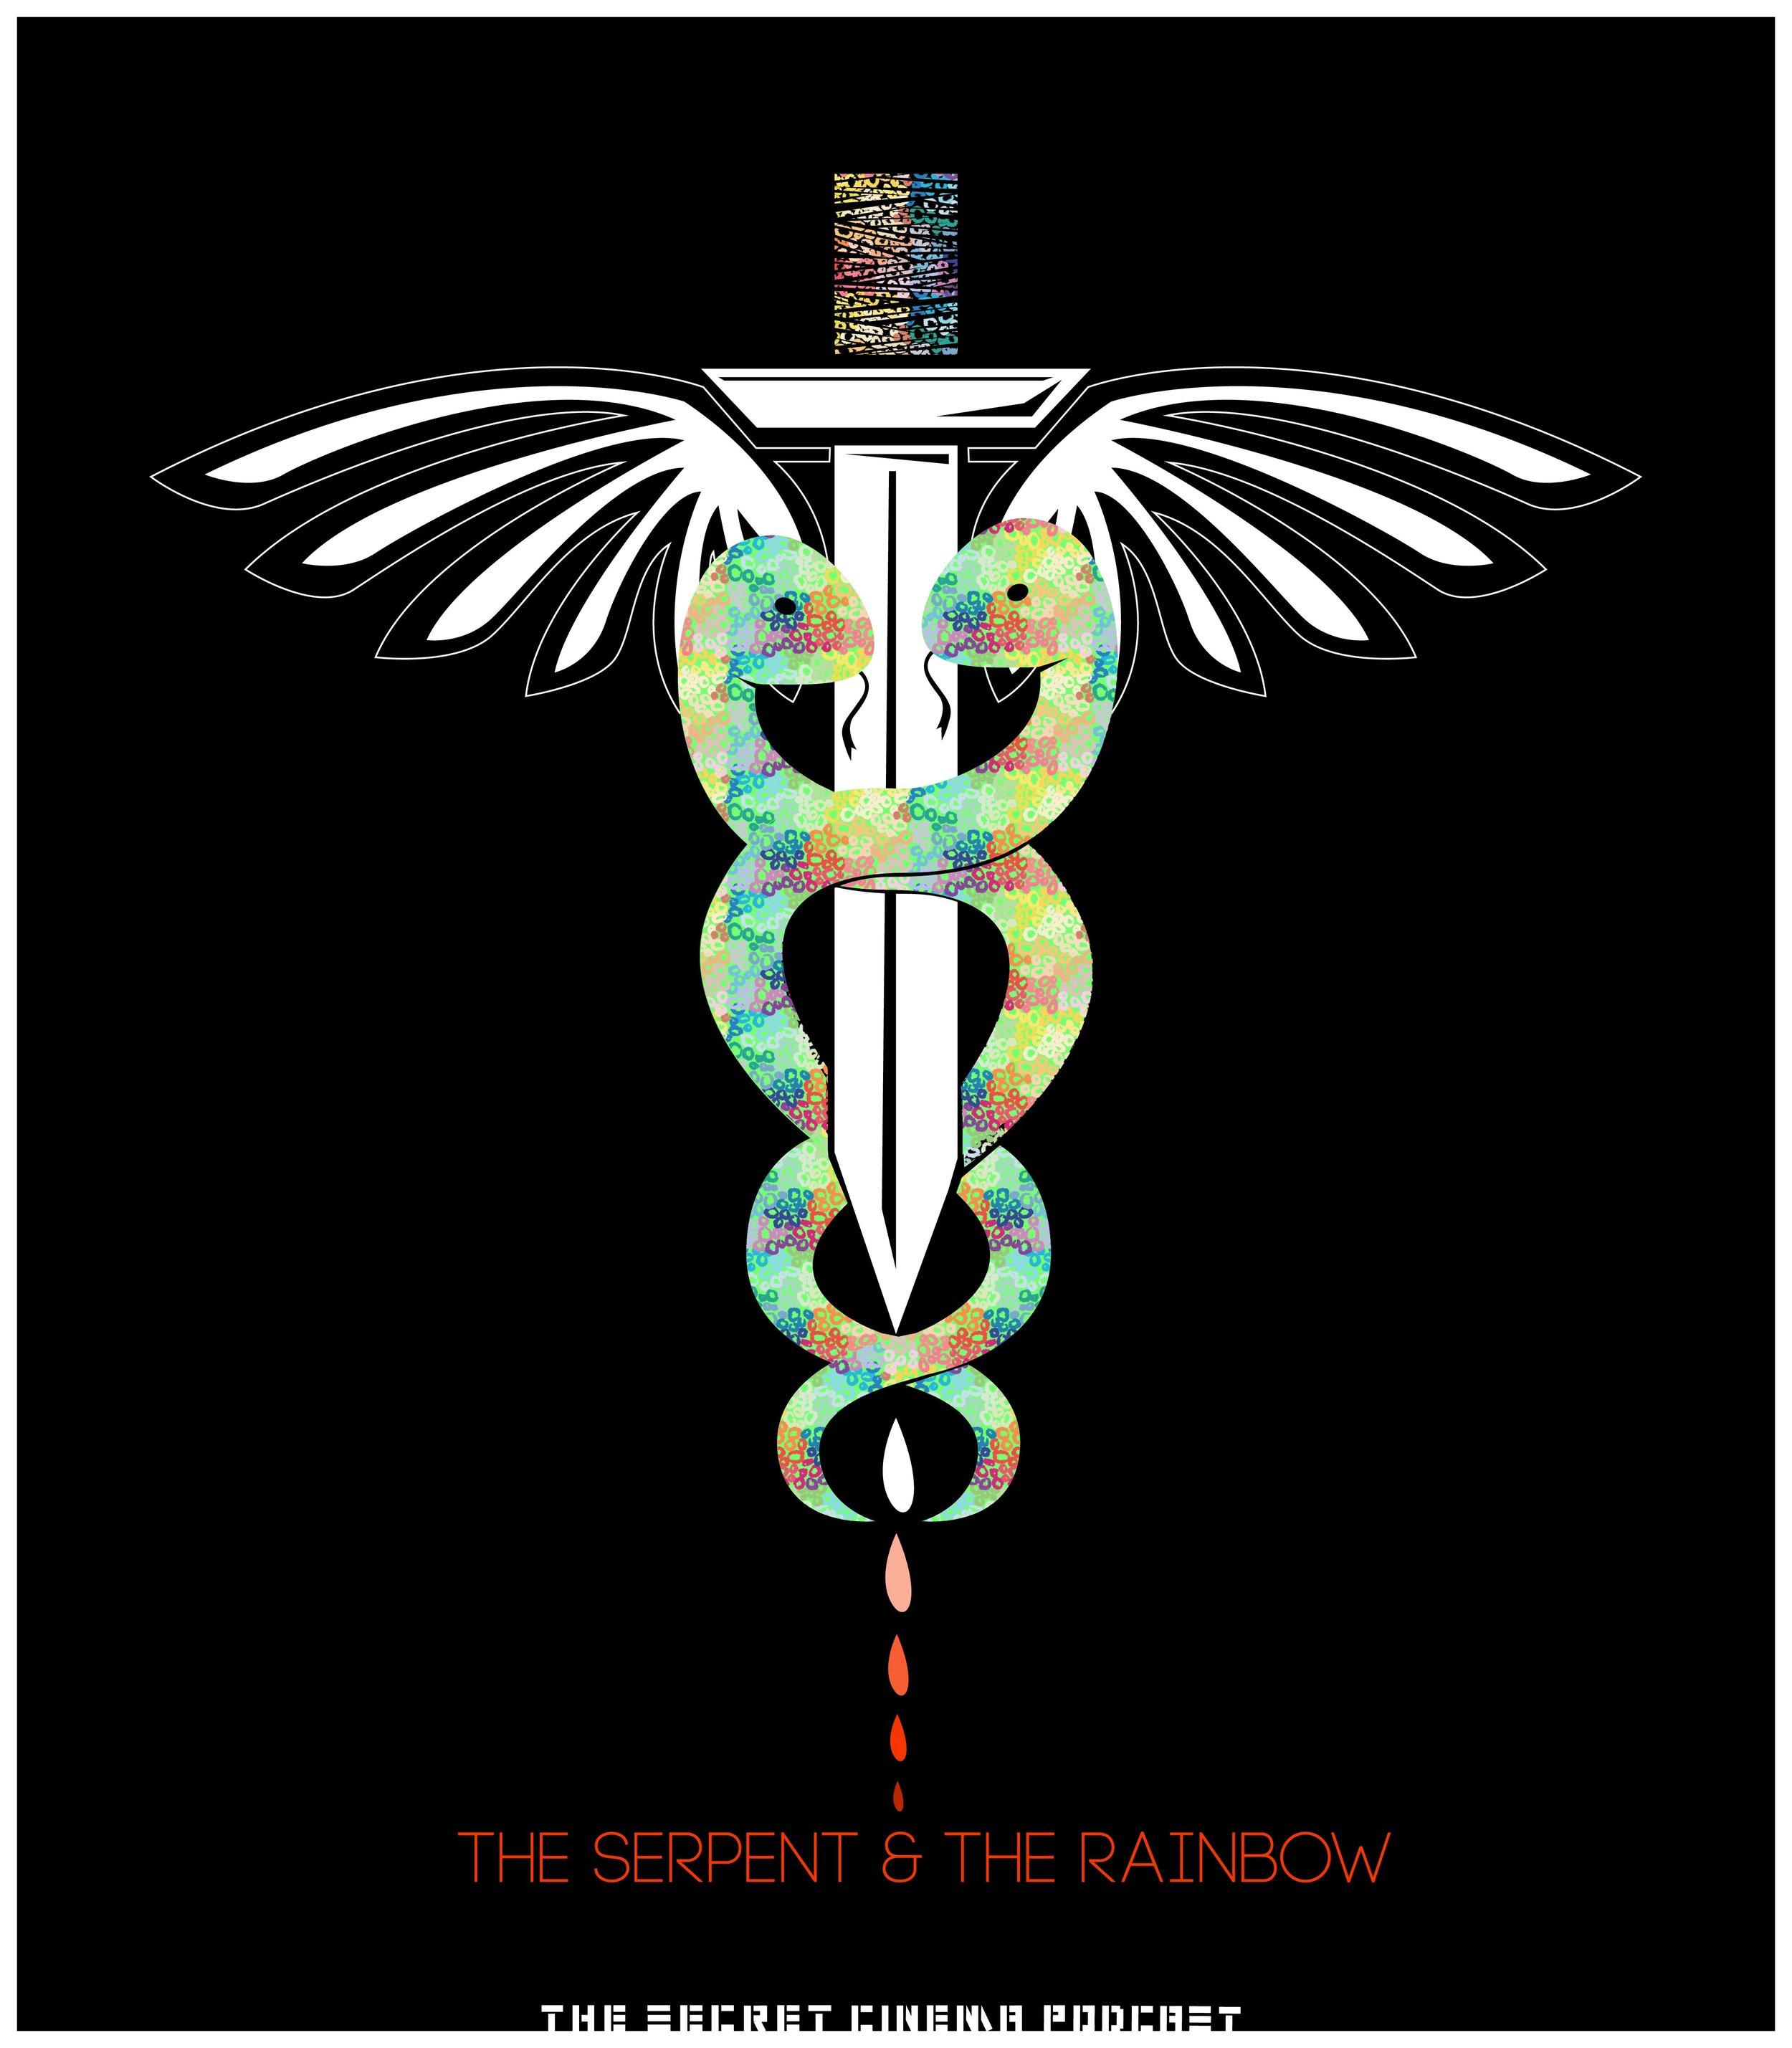 serpentrainbow-01.jpg